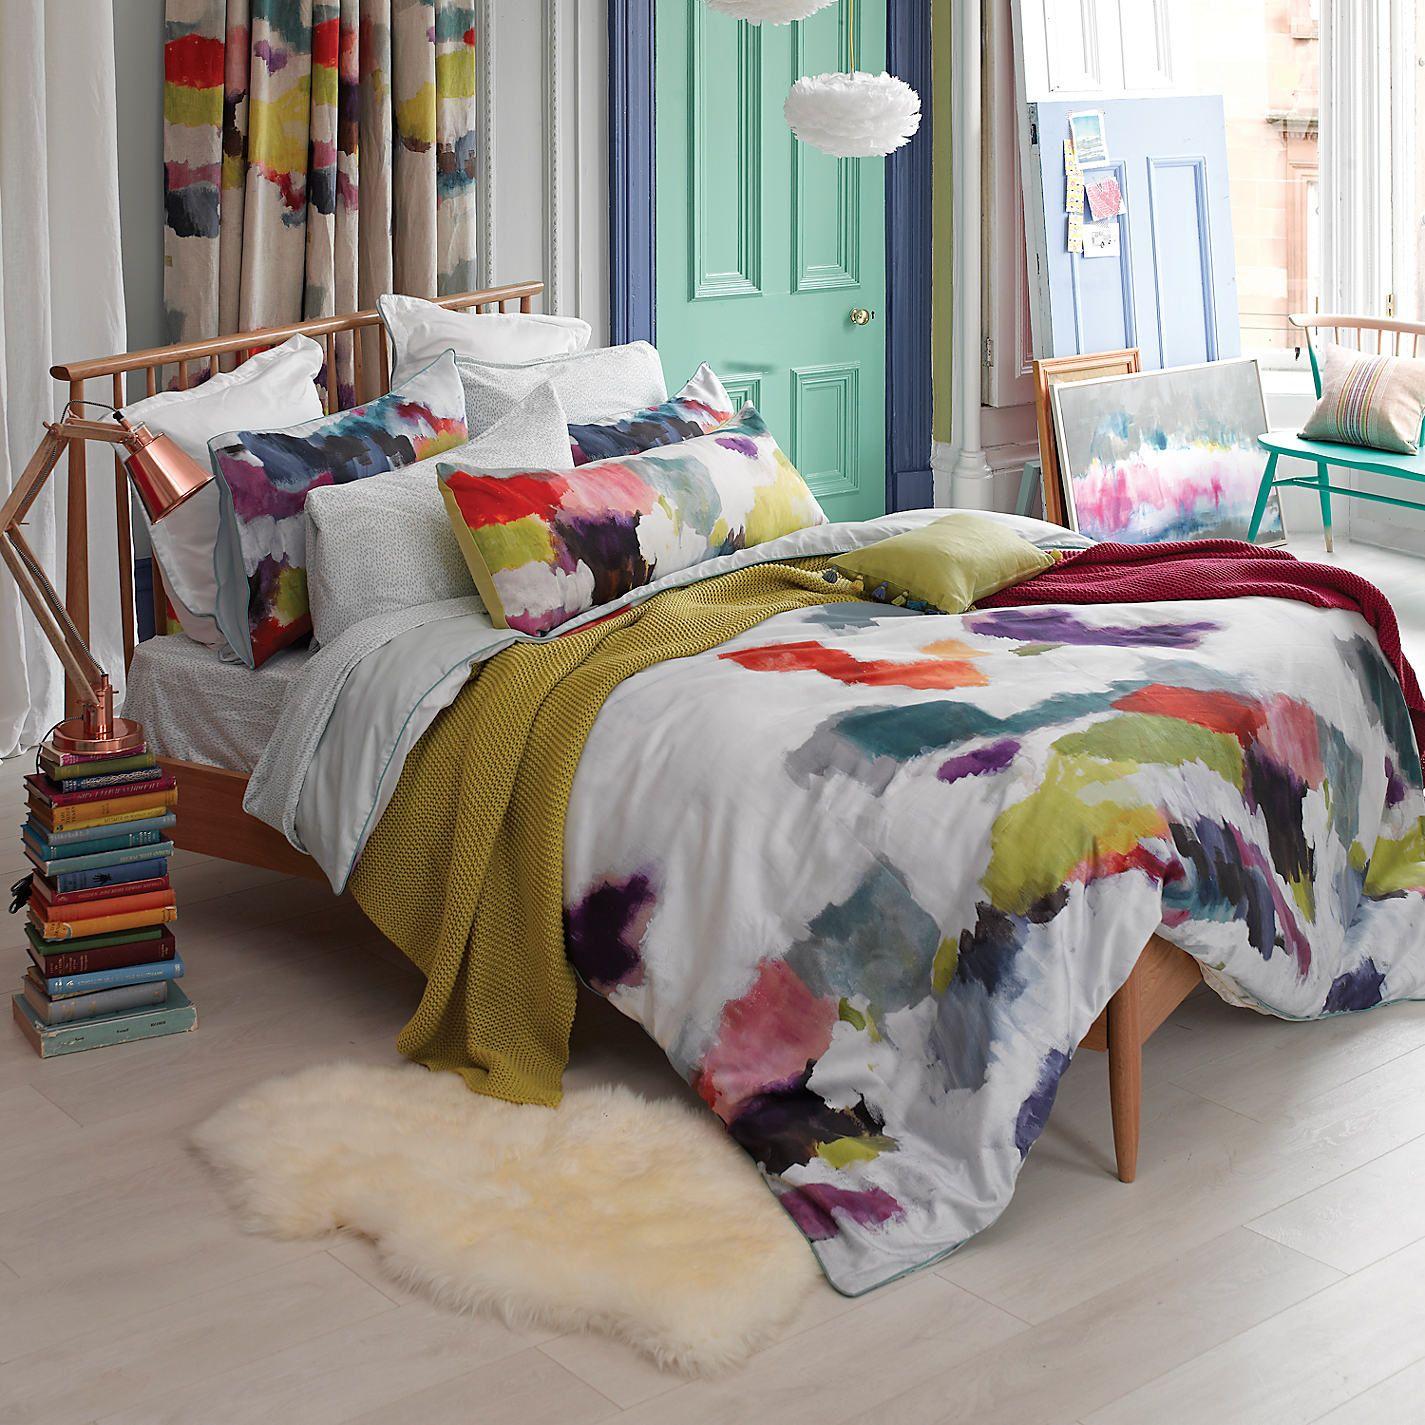 Bluebellgray Nevis Bedding From Our Duvet Covers Pillowcases Range At John Lewis Free